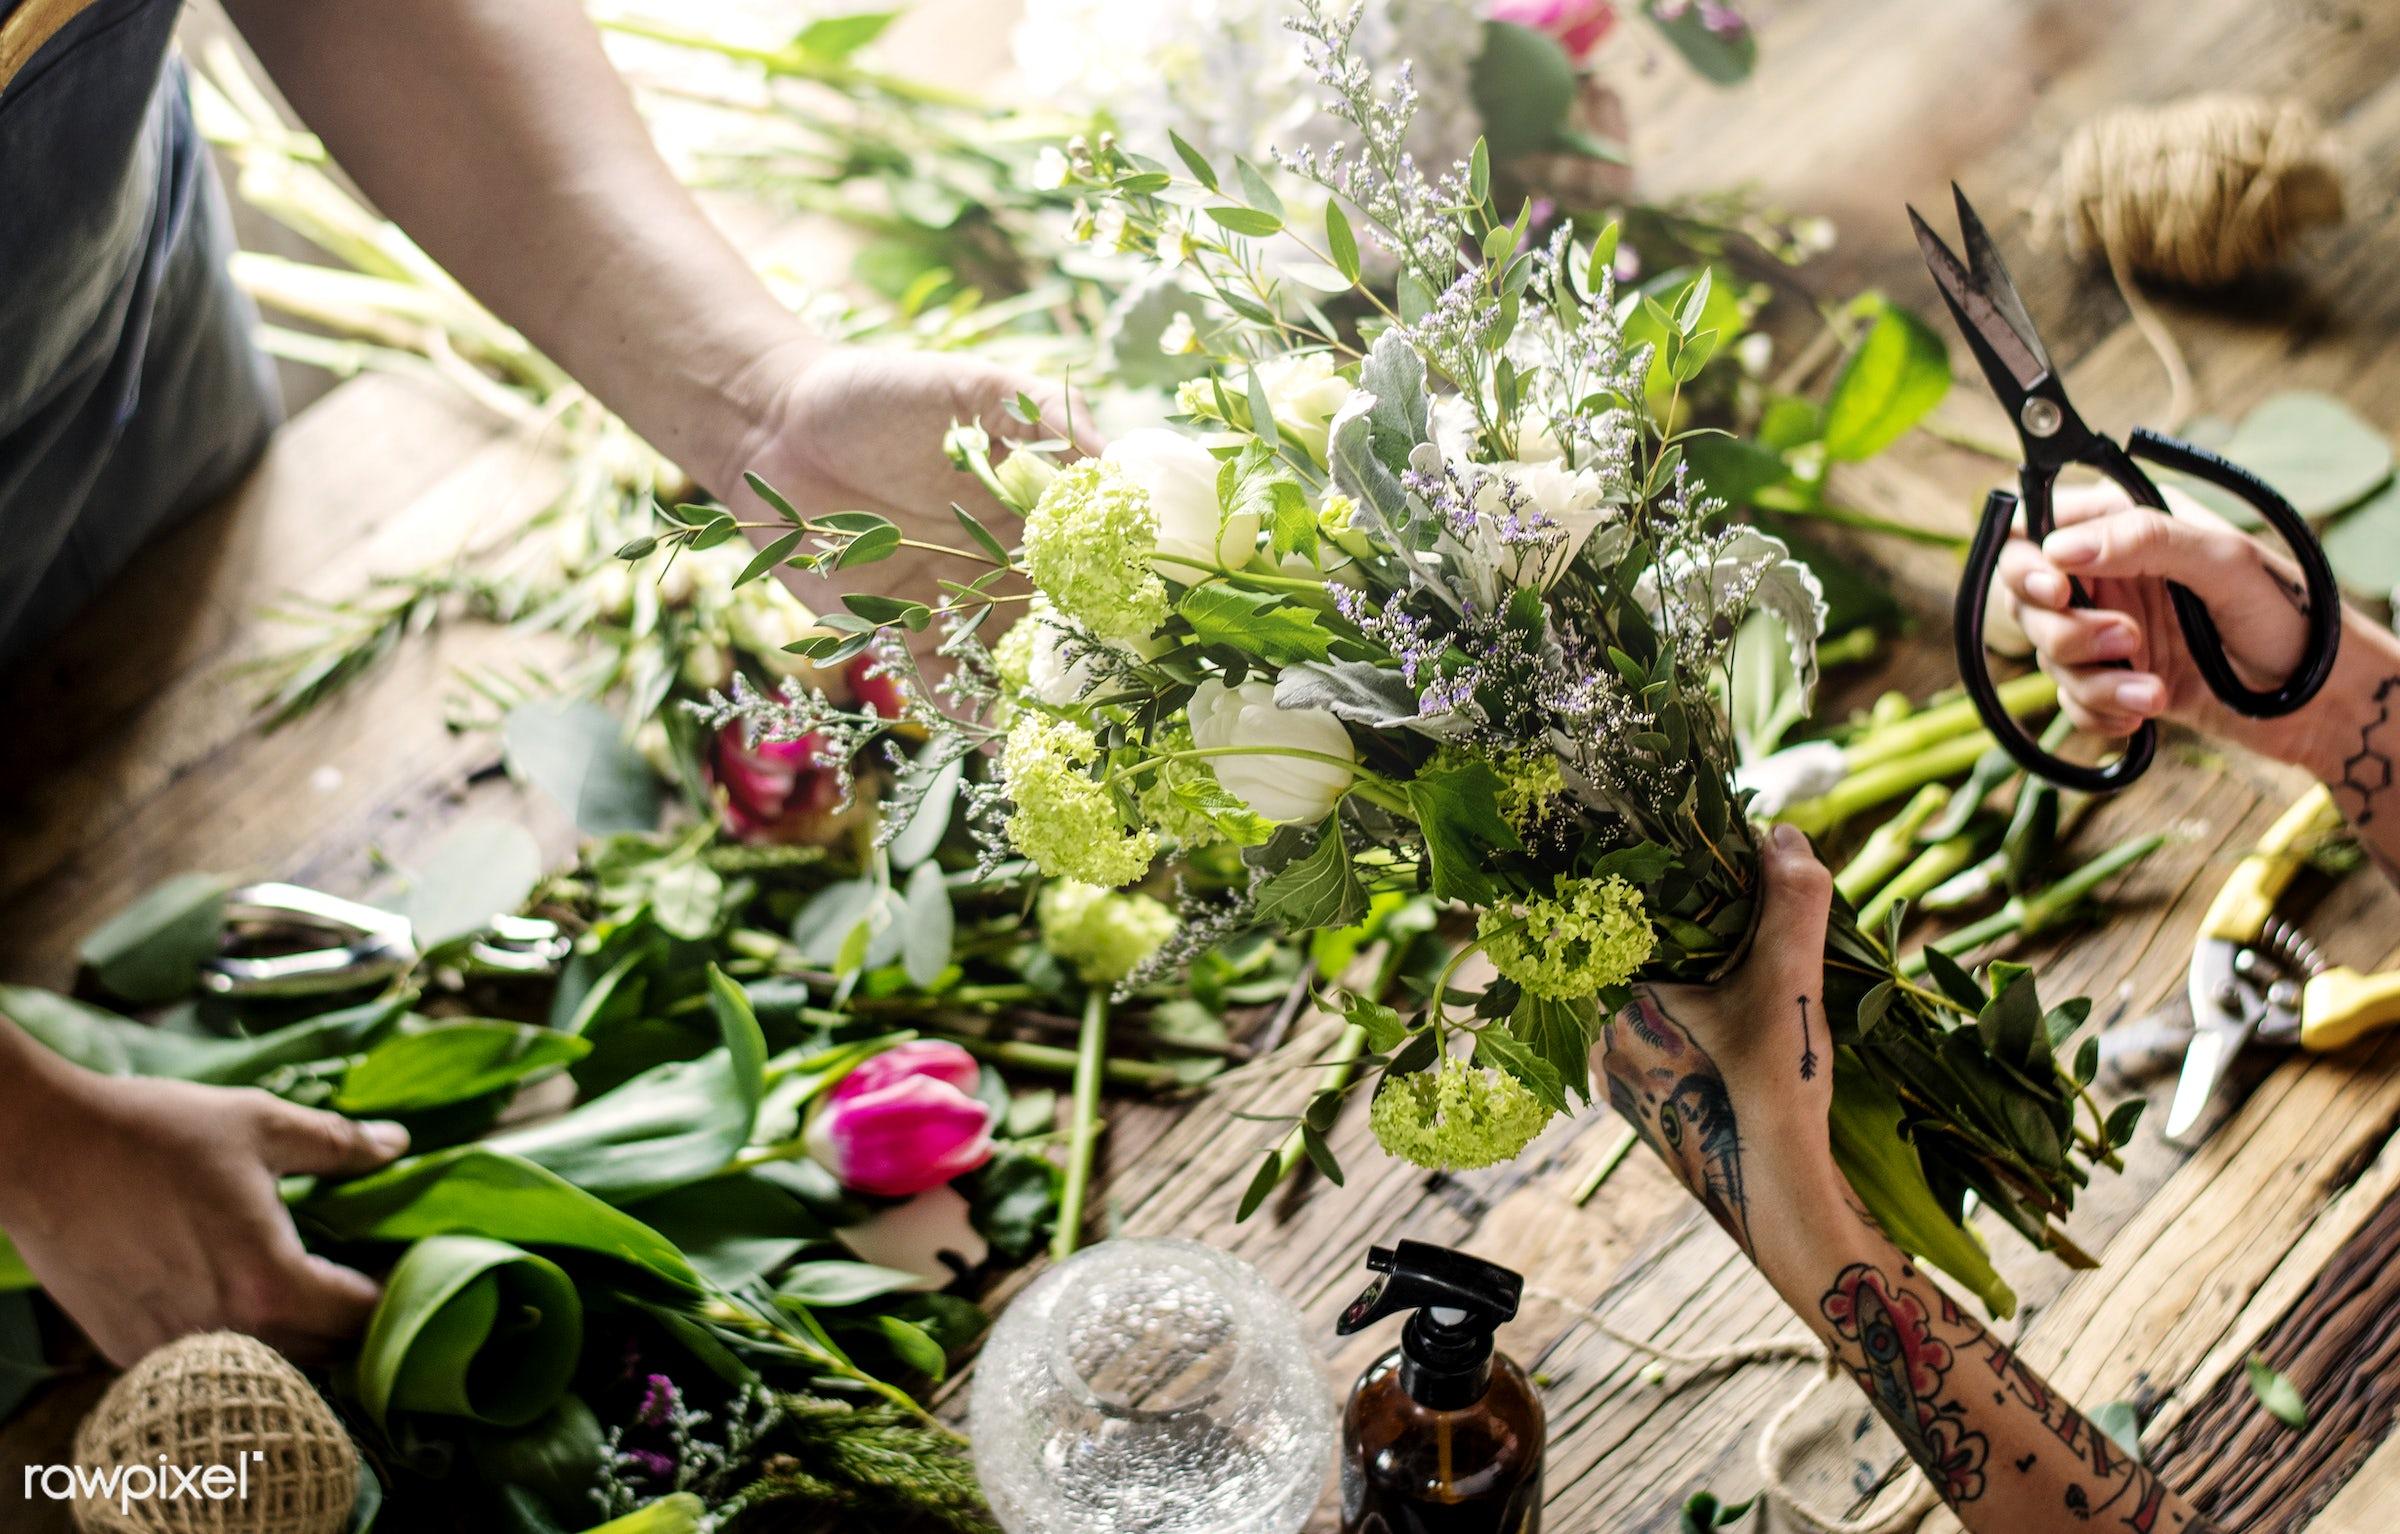 bouquet, shop, detail, person, merchandise, people, decor, nature, flowers, work, hold, refreshment, career, florist,...